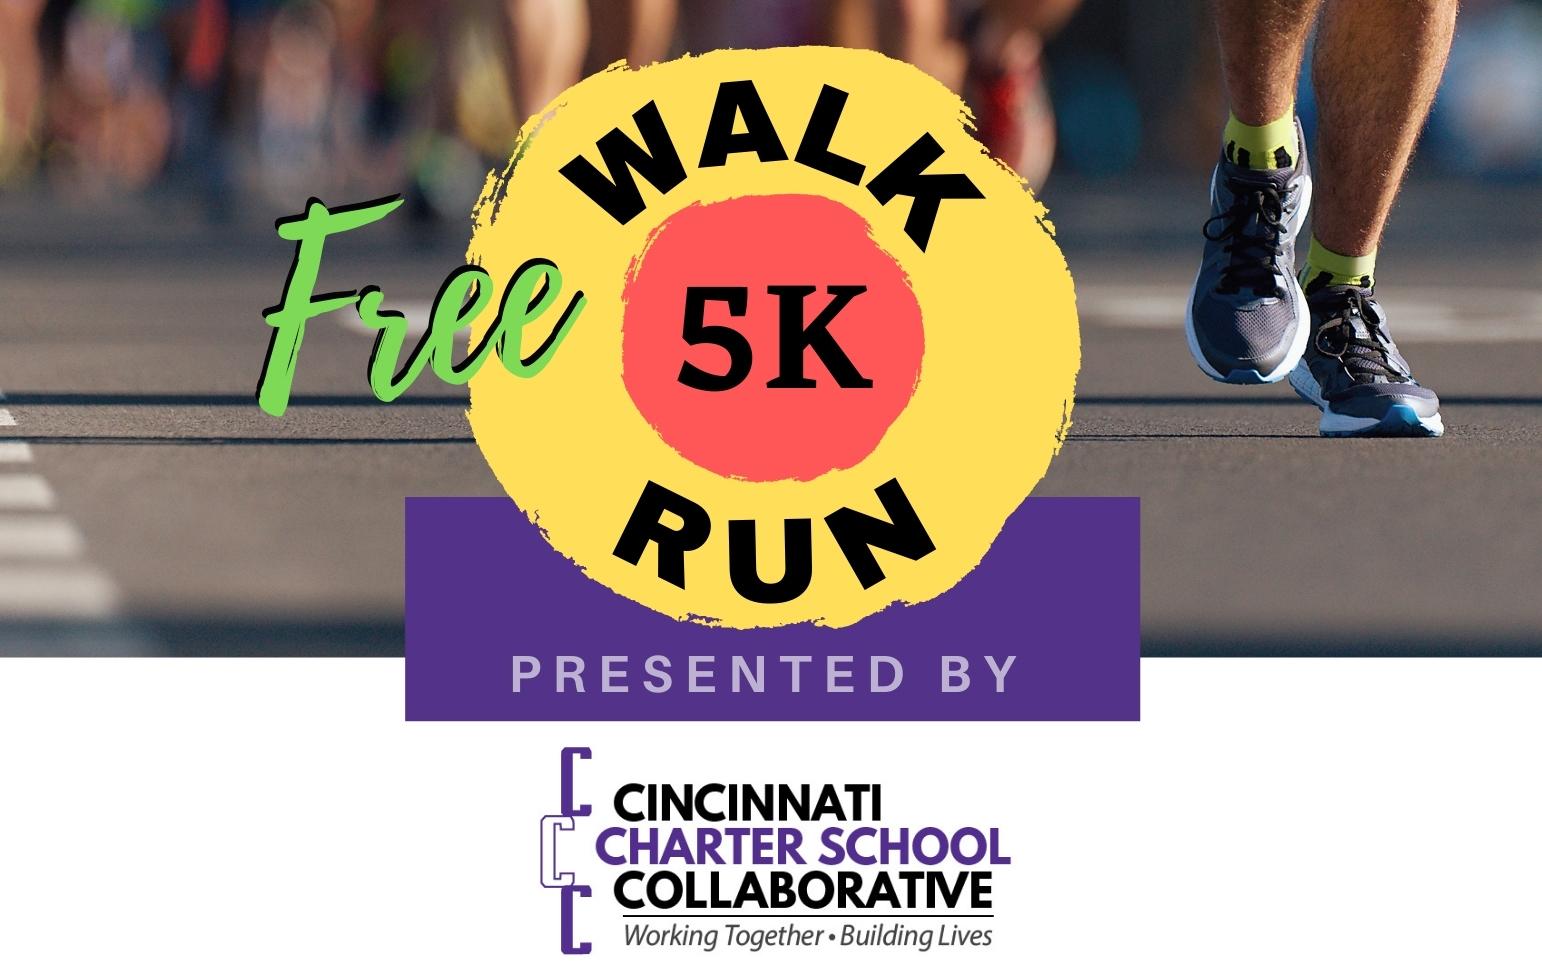 Charter Schools 5K walk / Run